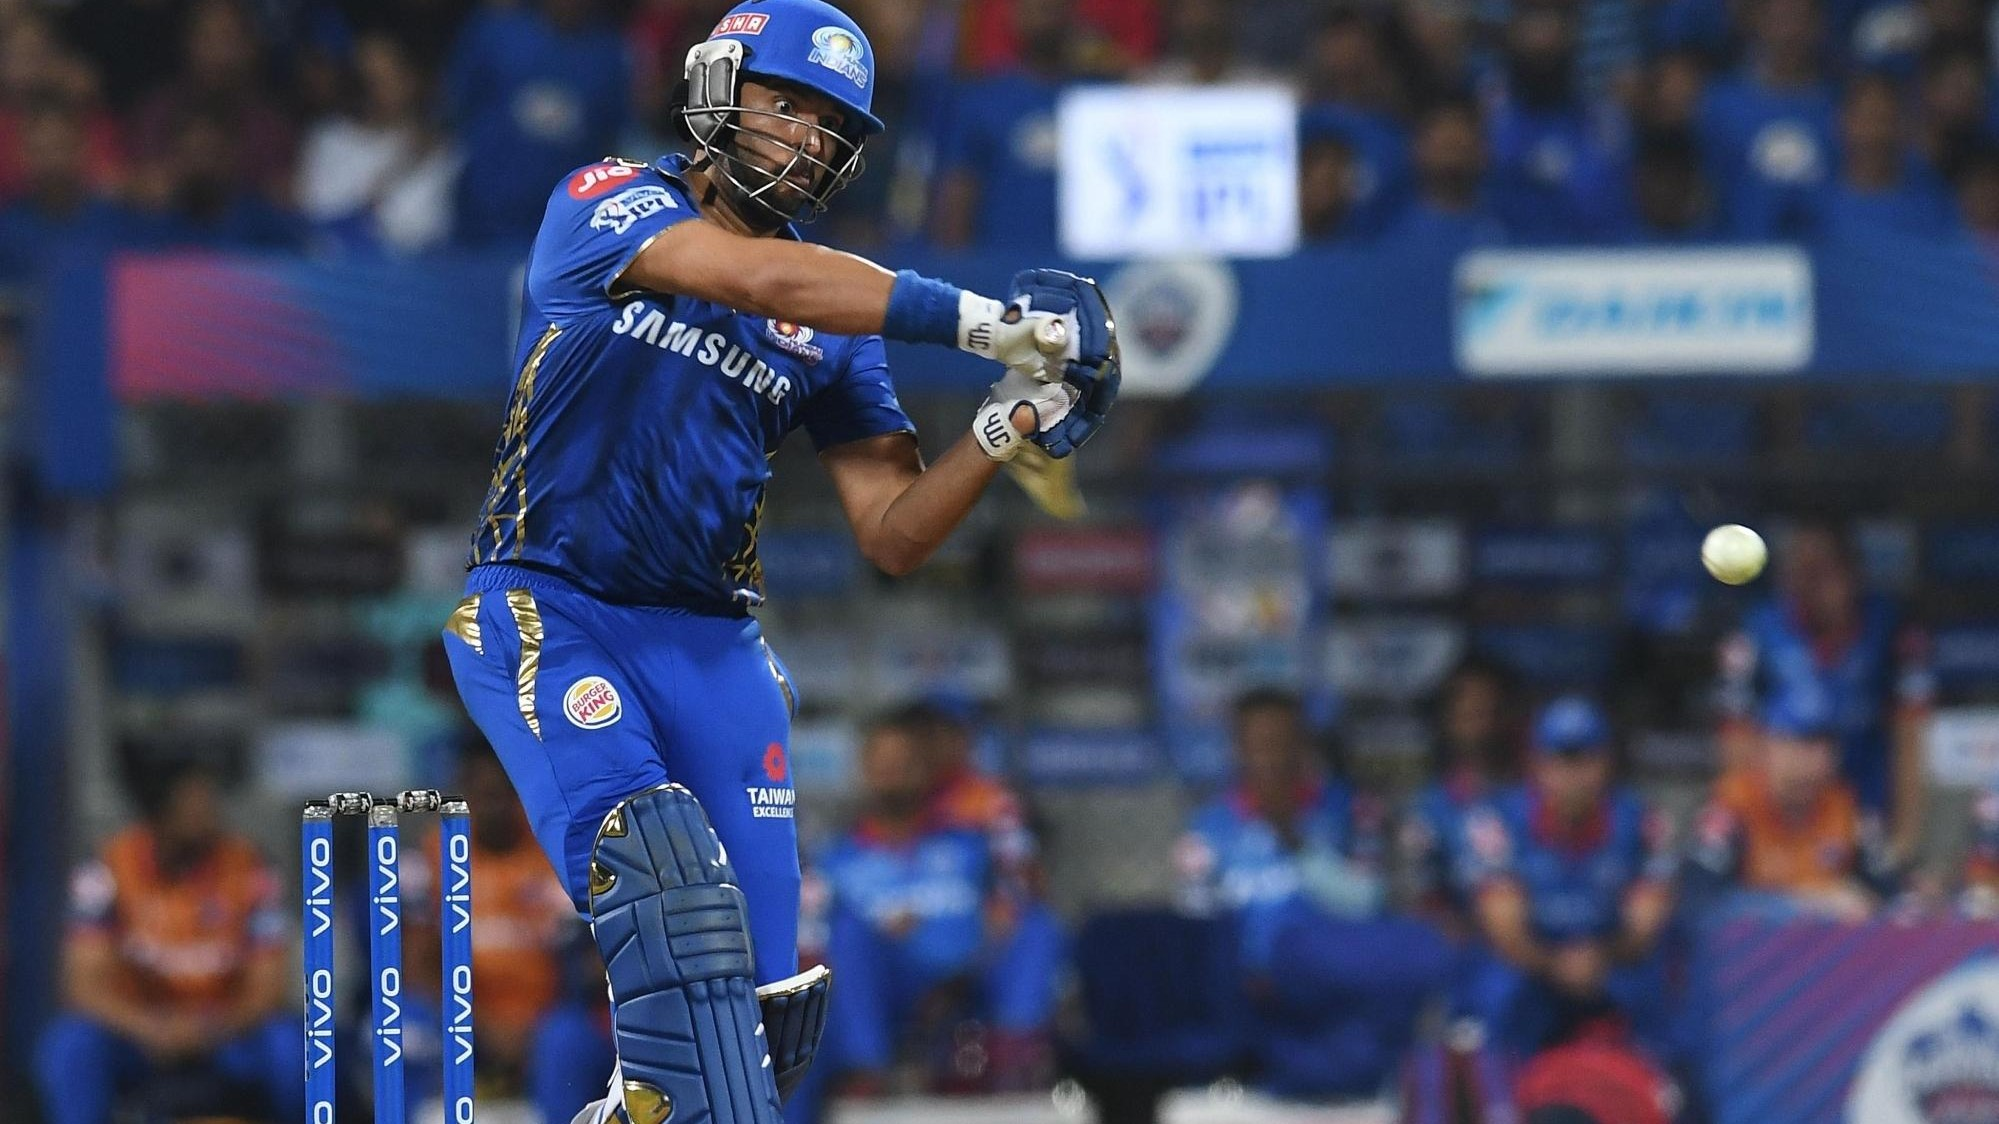 IPL 2019: RCB v MI – Twitterati go crazy as Yuvraj Singh hits 3 consecutive sixes off Yuzvendra Chahal